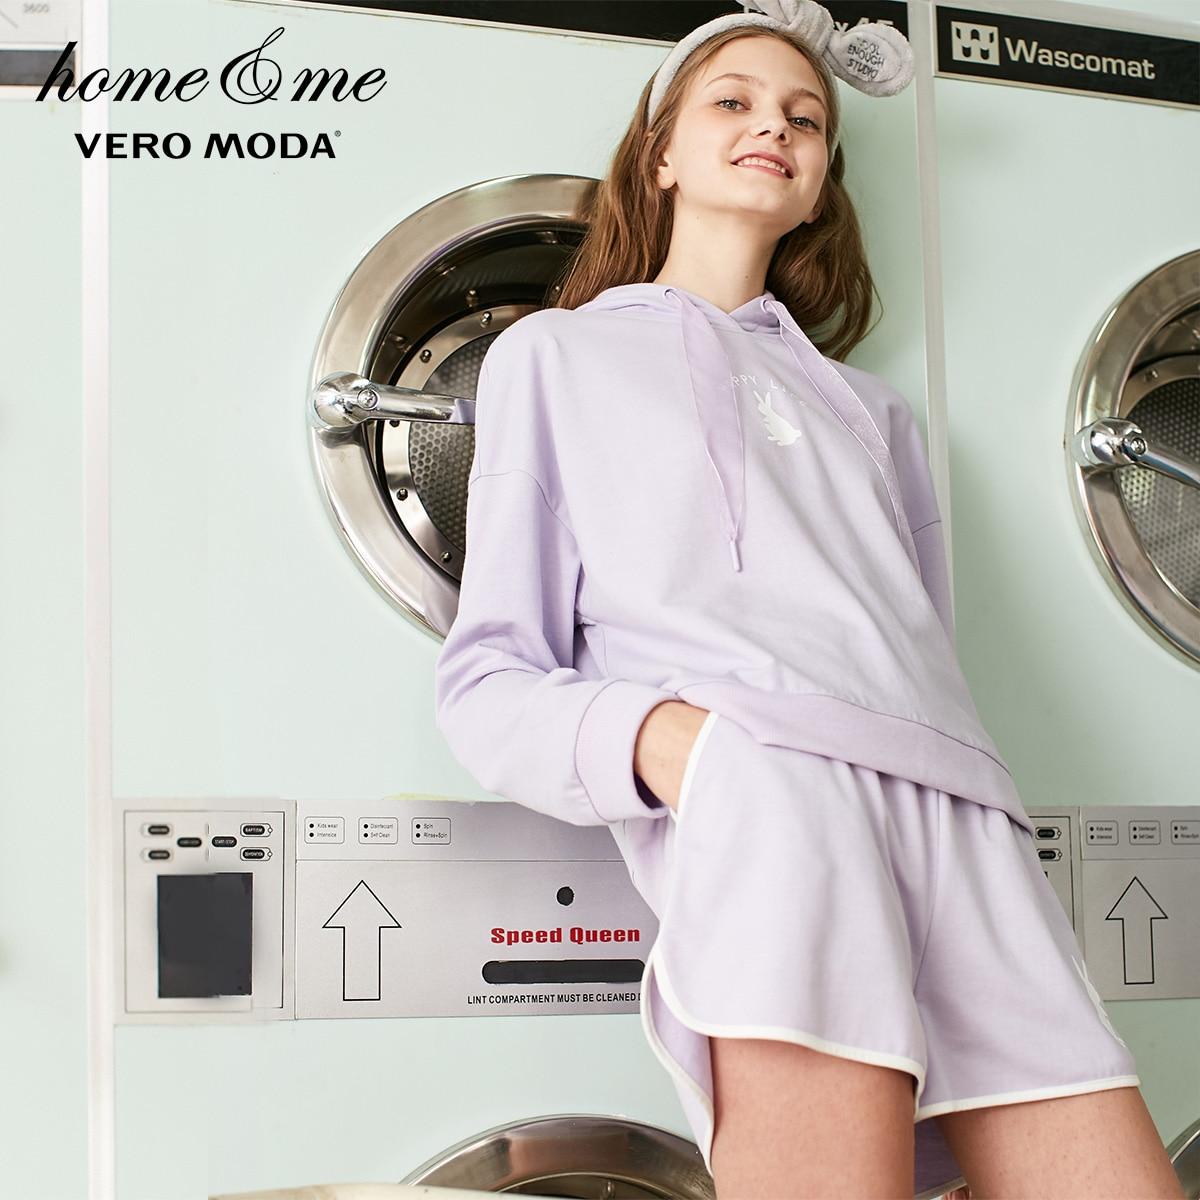 Vero Moda New Arrivals Women's Rabbit Print 100% Cotton Elasticized Waist Shorts  | 3191R2504